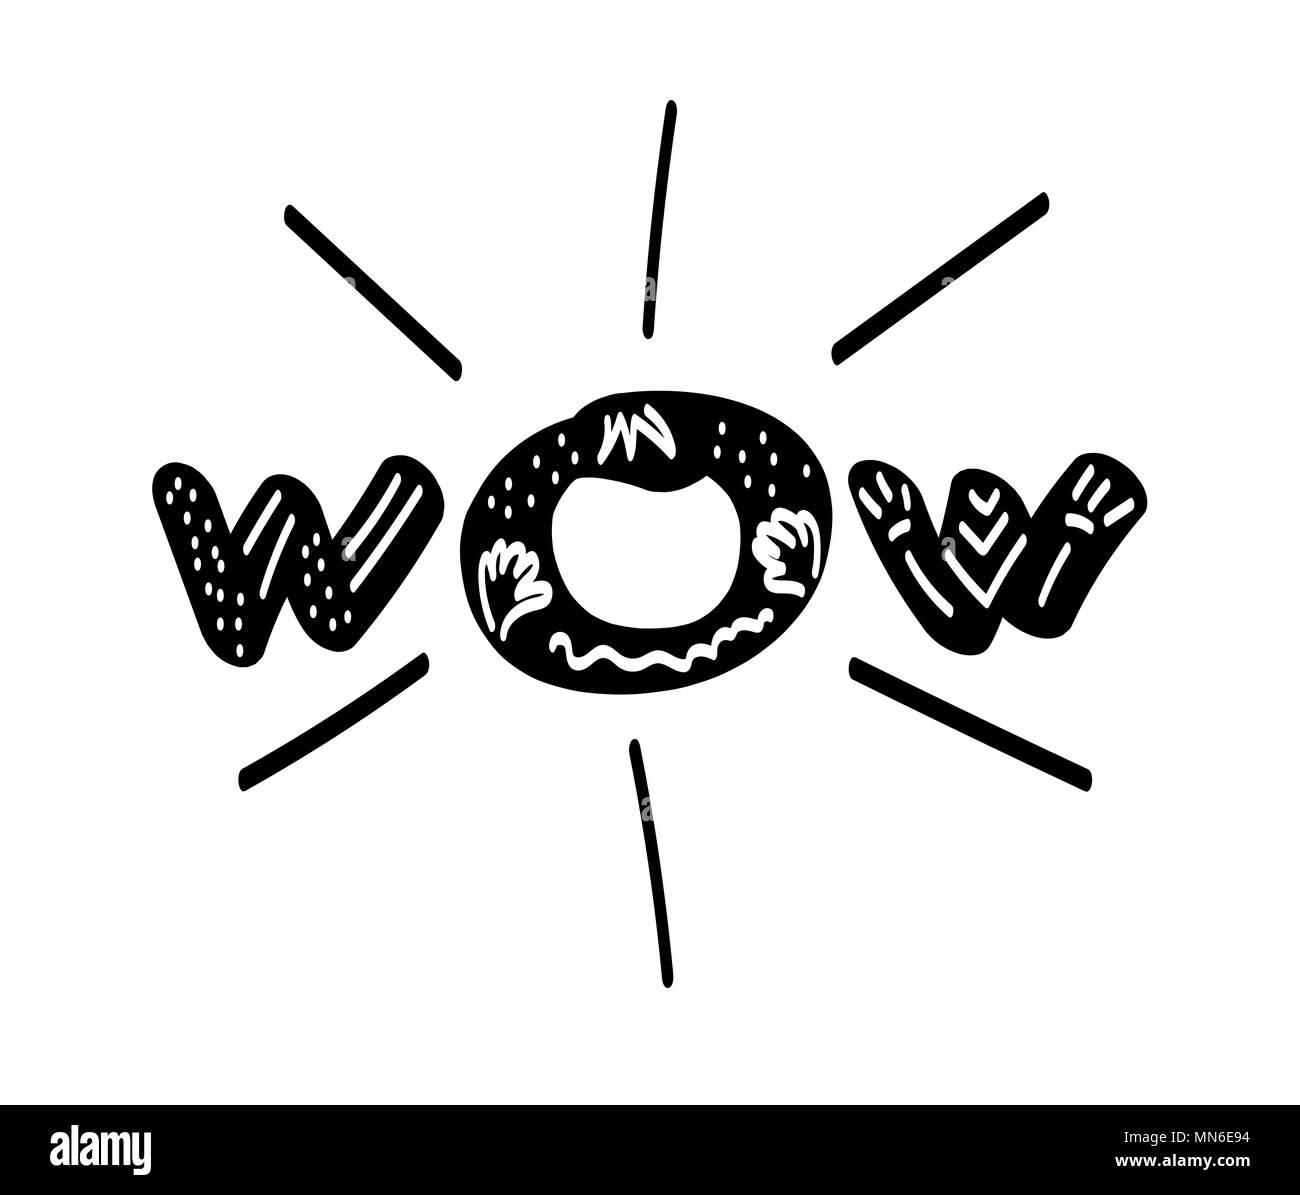 https www alamy com wow inscription hand drawn design word for card print poster emblem textile cloth paper vector illustration image185154400 html